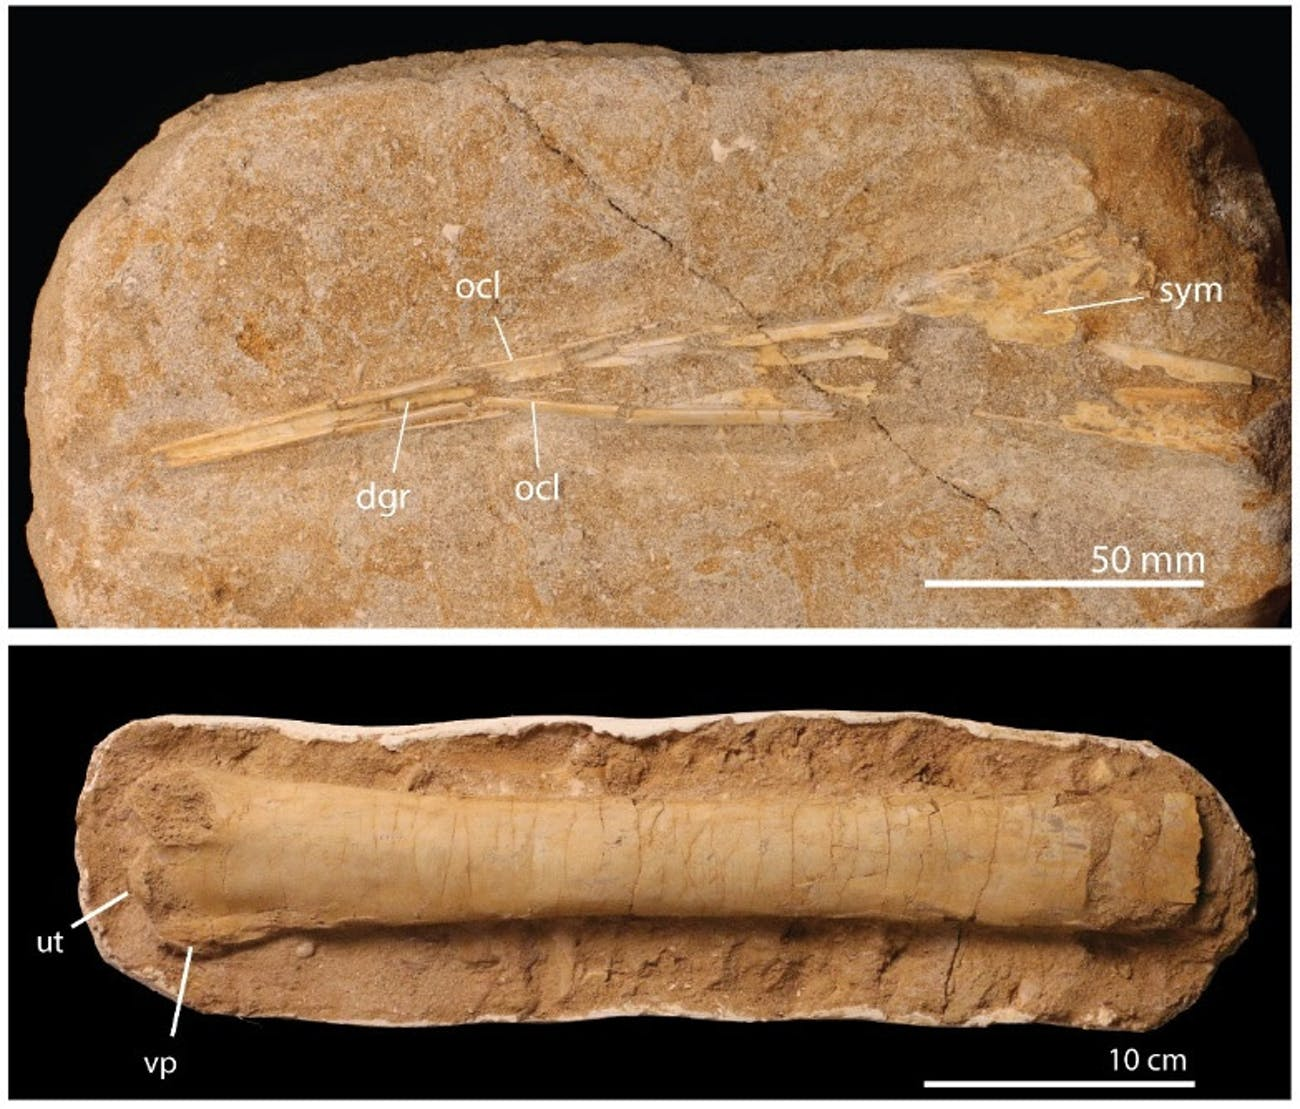 pterosaur fossils